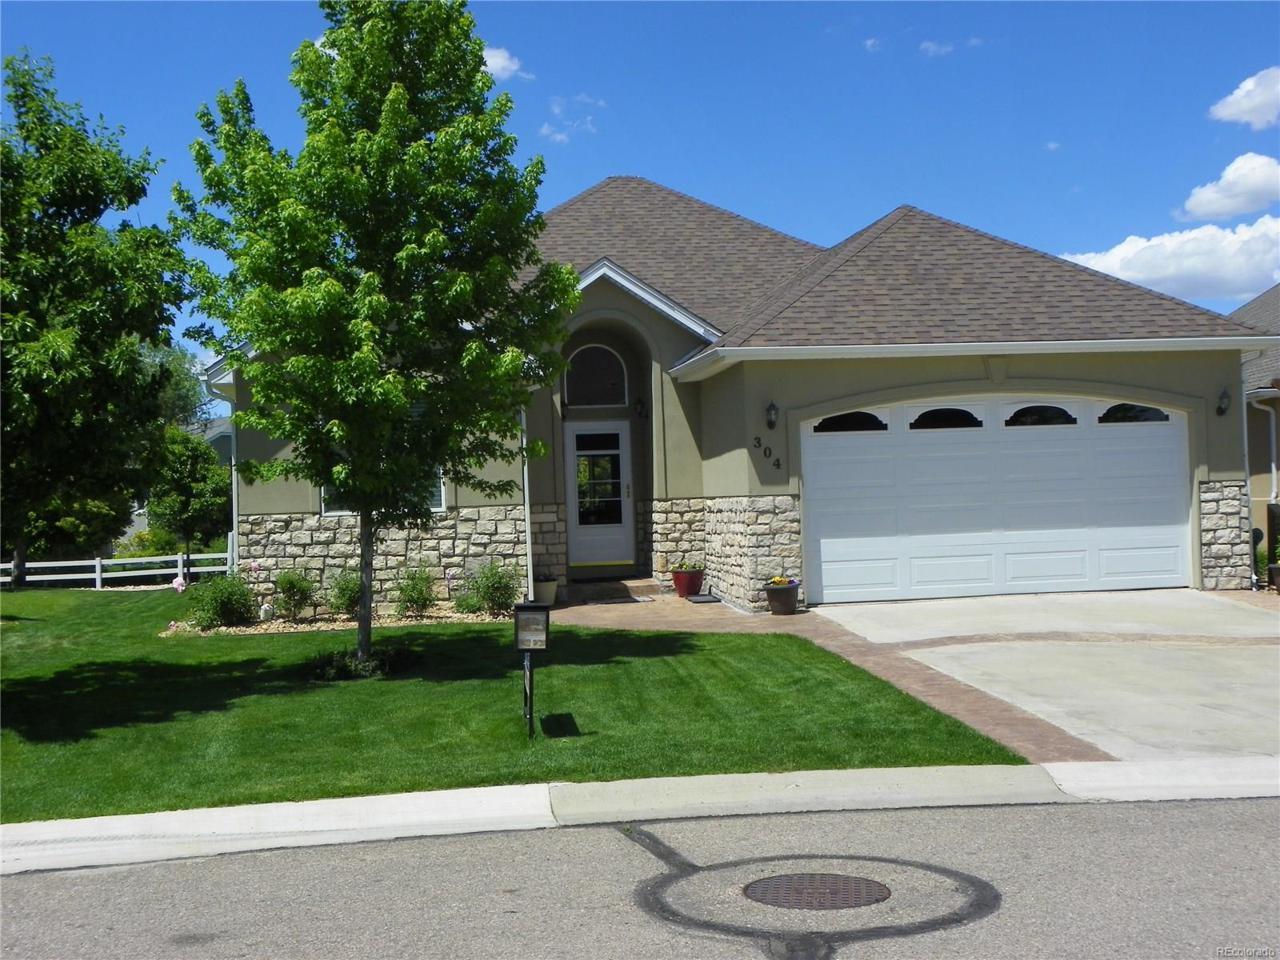 304 Sandy Lane, Windsor, CO 80550 (MLS #3091901) :: 8z Real Estate